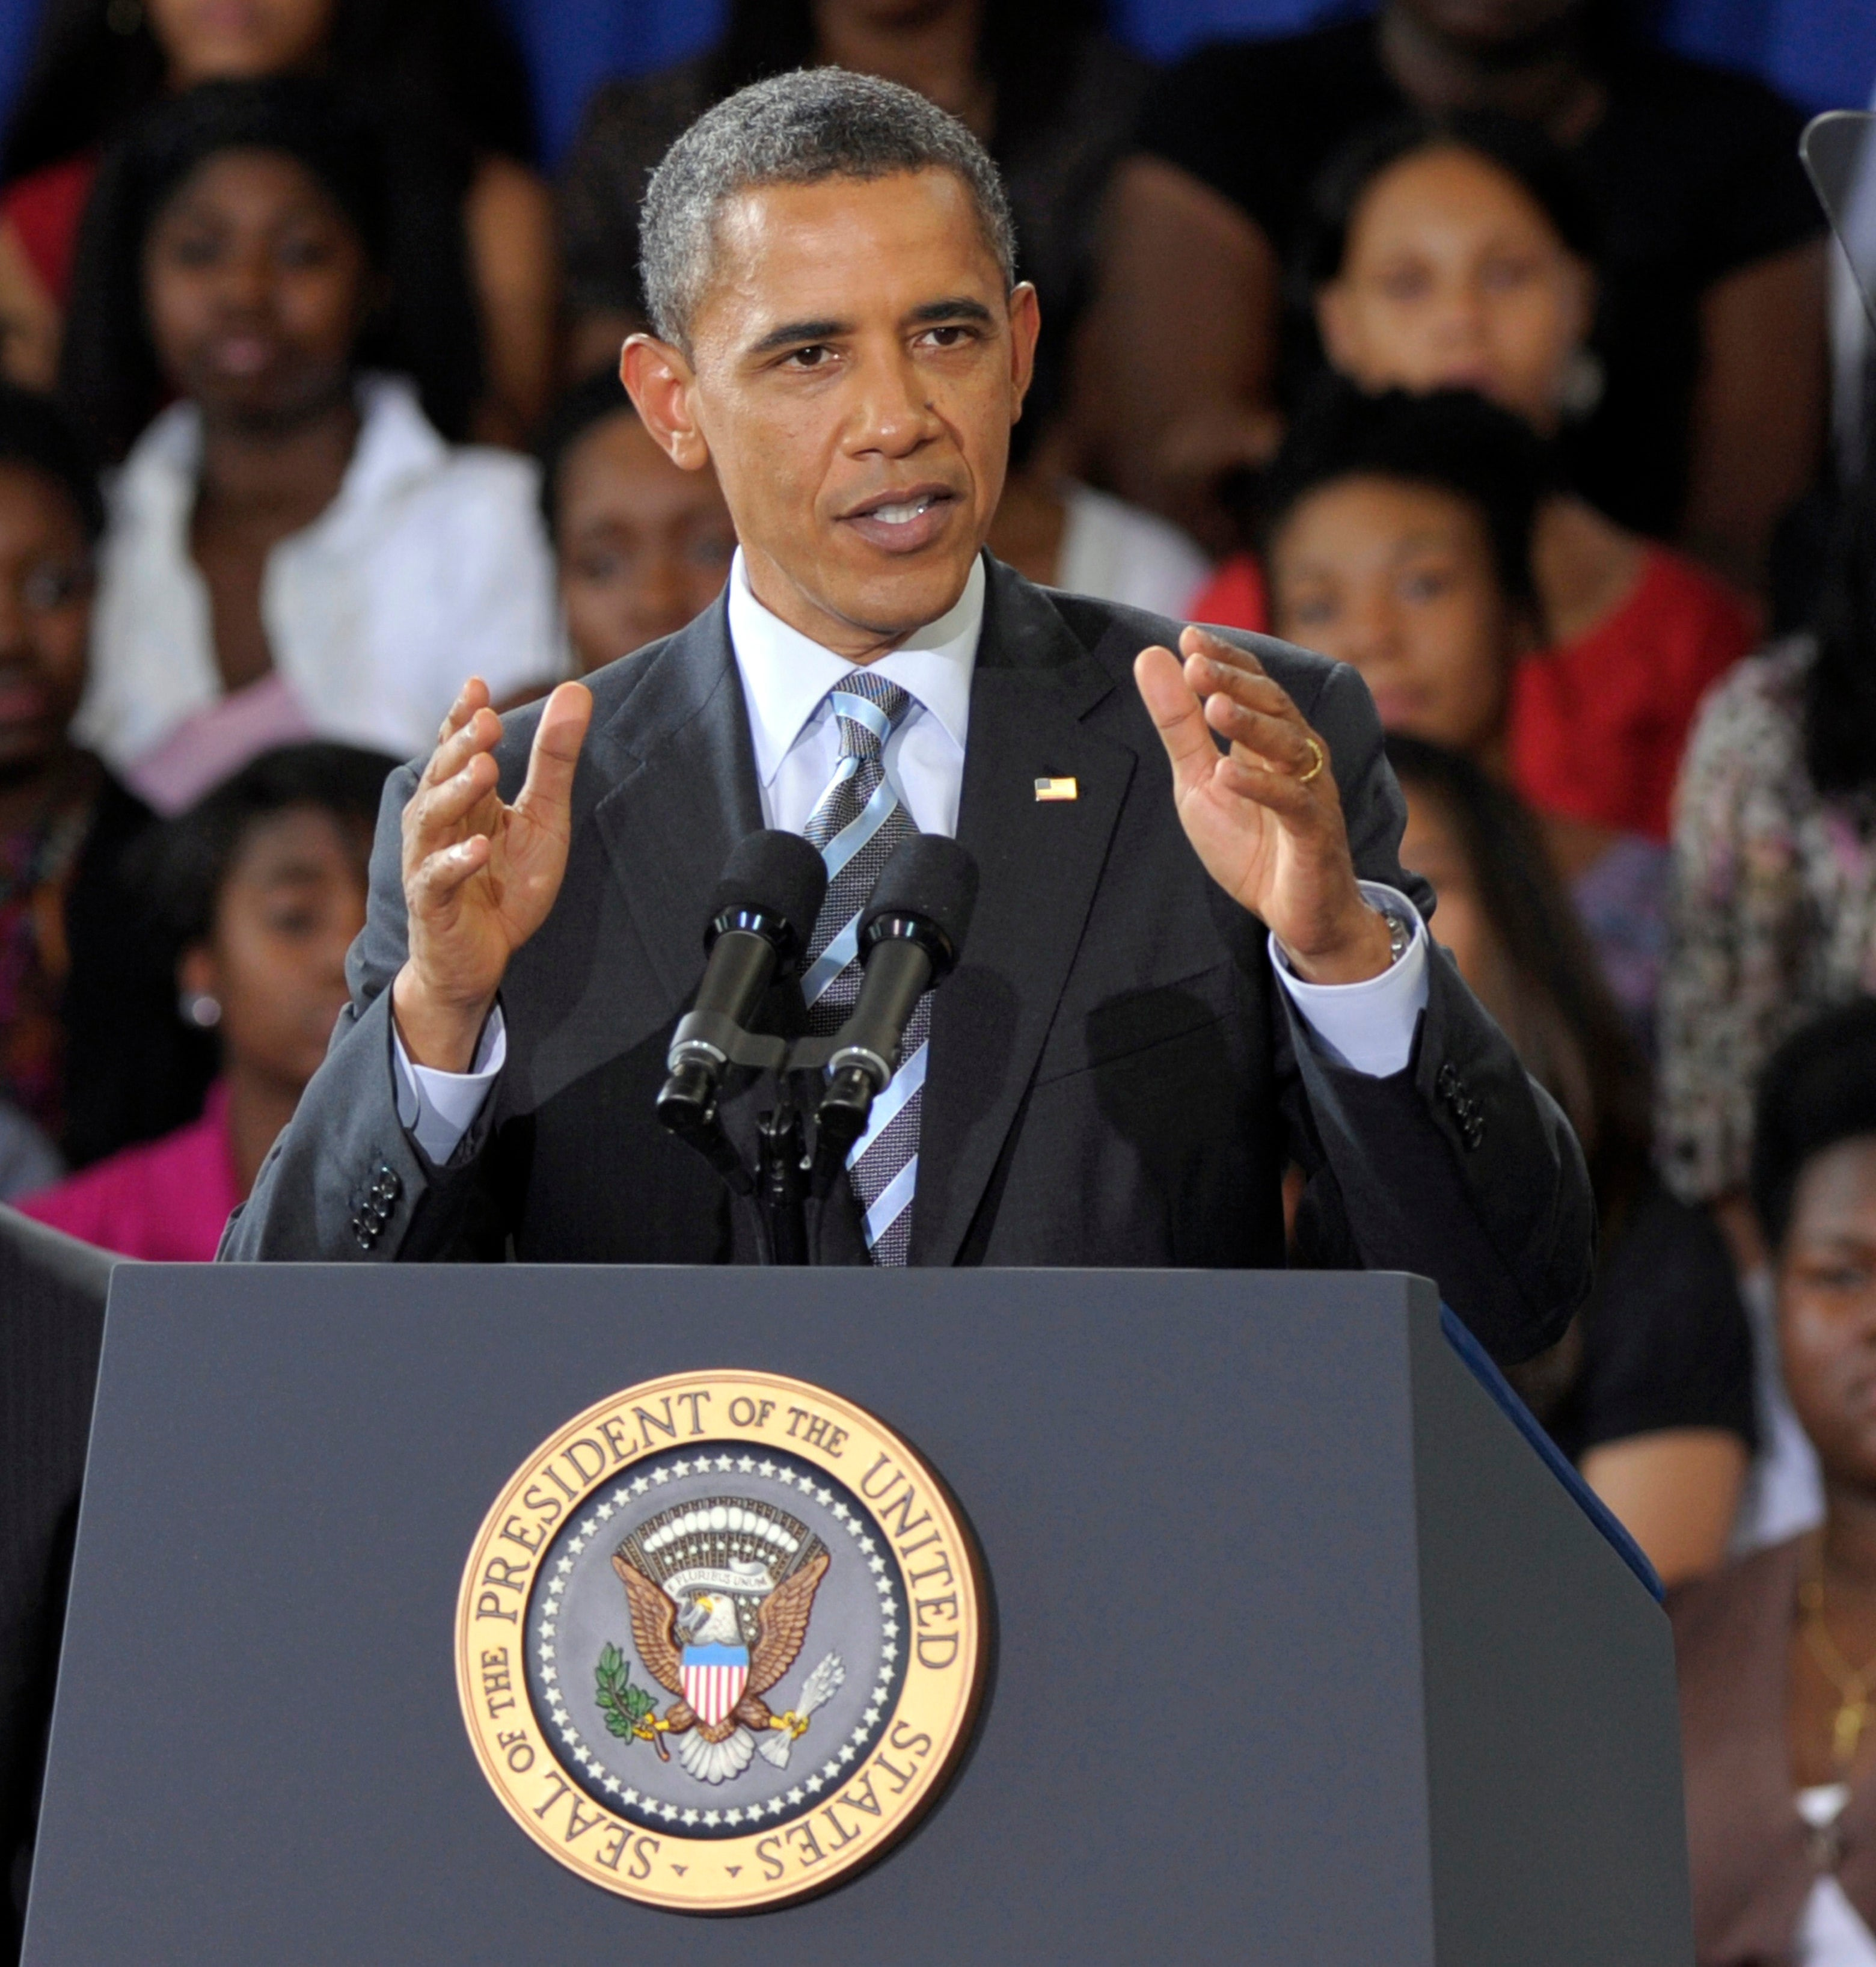 President Obama Goes Pink for Breast Cancer Awareness